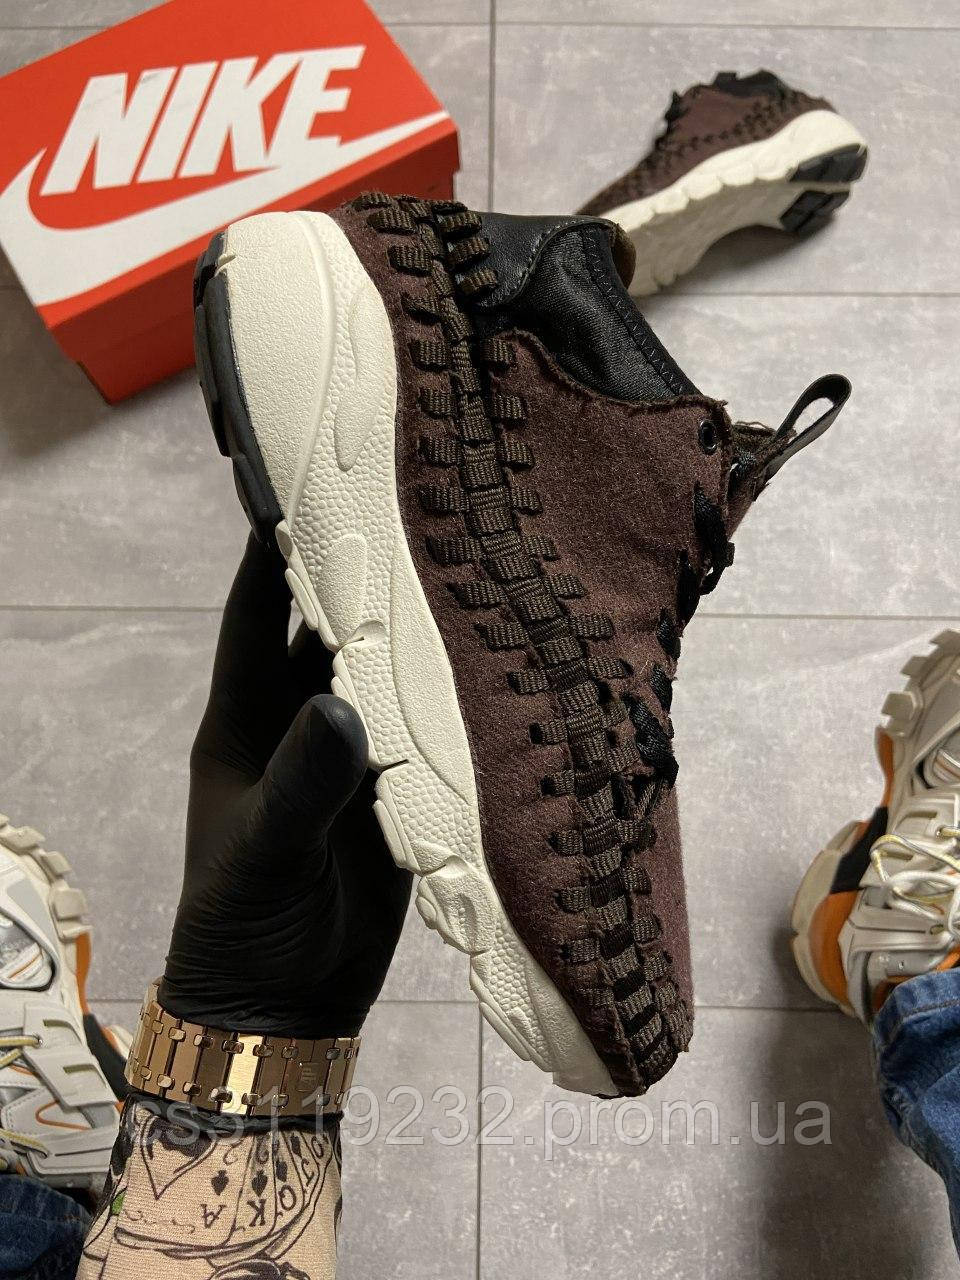 Мужские кроссовки Nike Footscape Woven Suede Brown (коричневый)